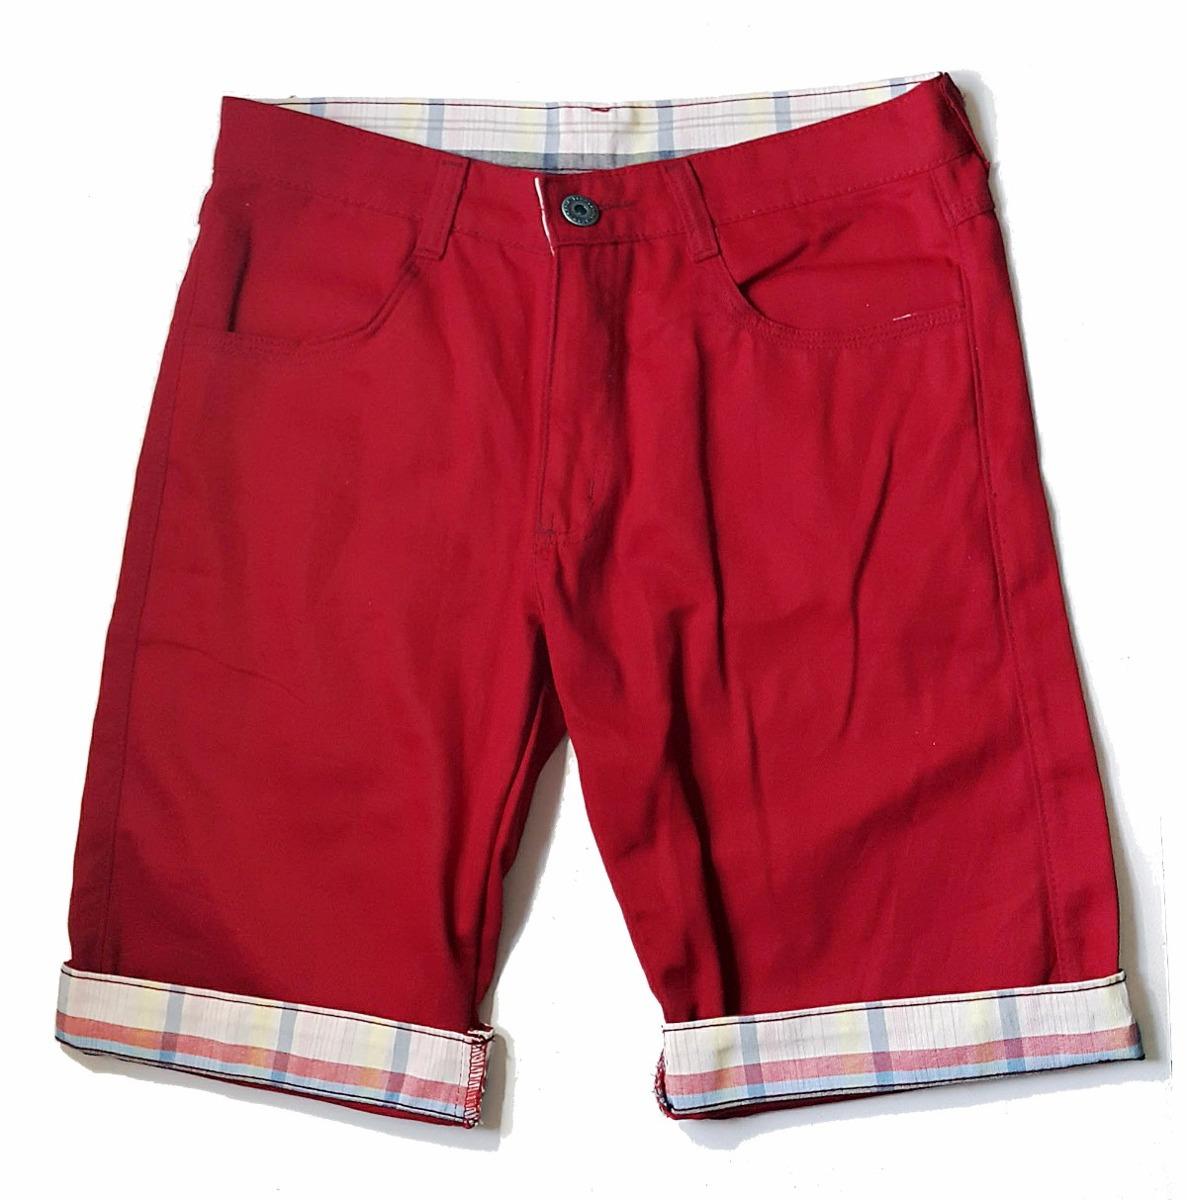 b93cdafd71 kit 4 bermudas masculina sarja atacado colorida barra jeans. Carregando  zoom.